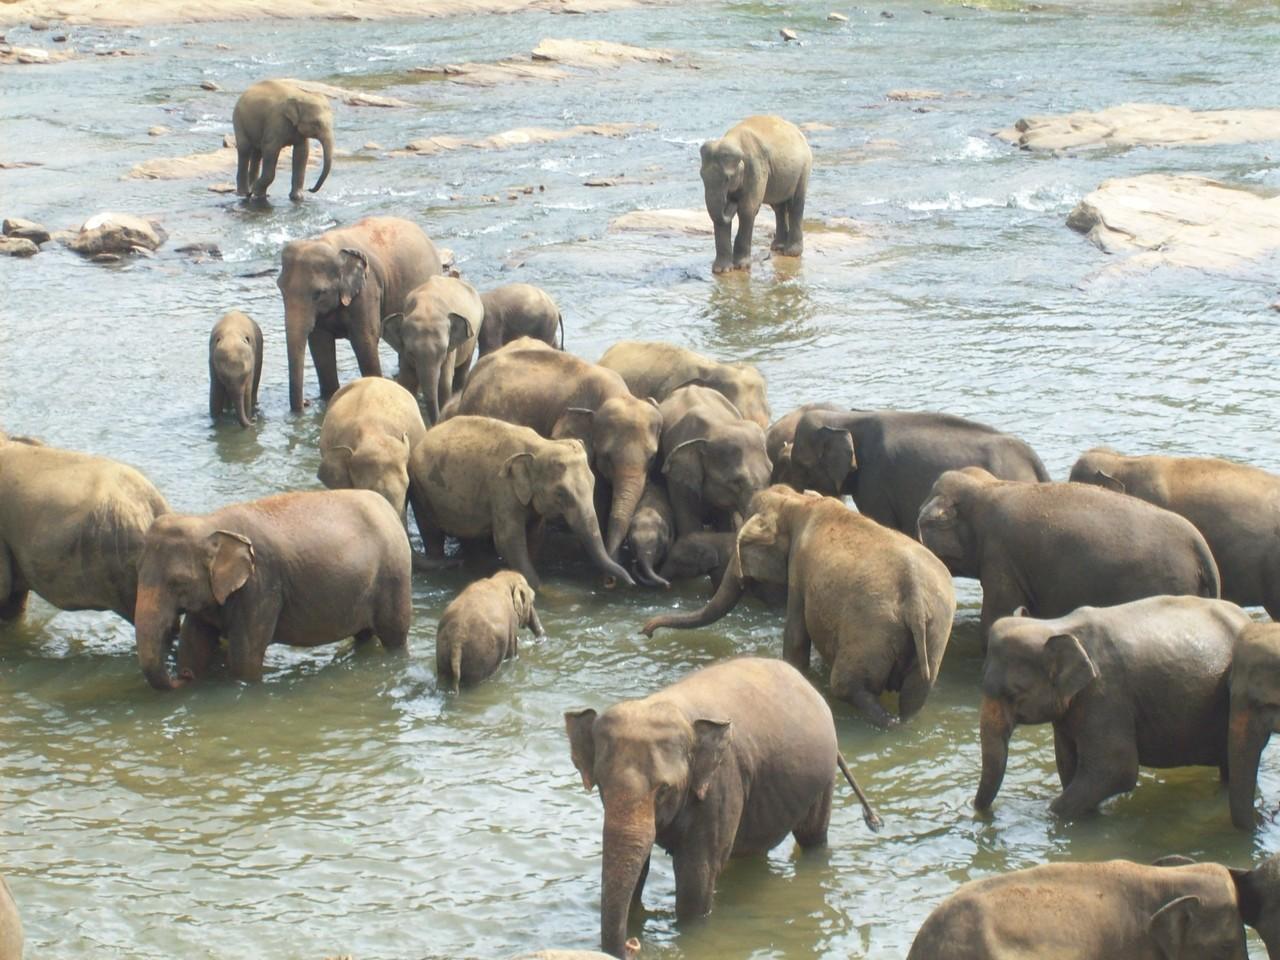 Elefantenwaisenhaus, Pinnawela